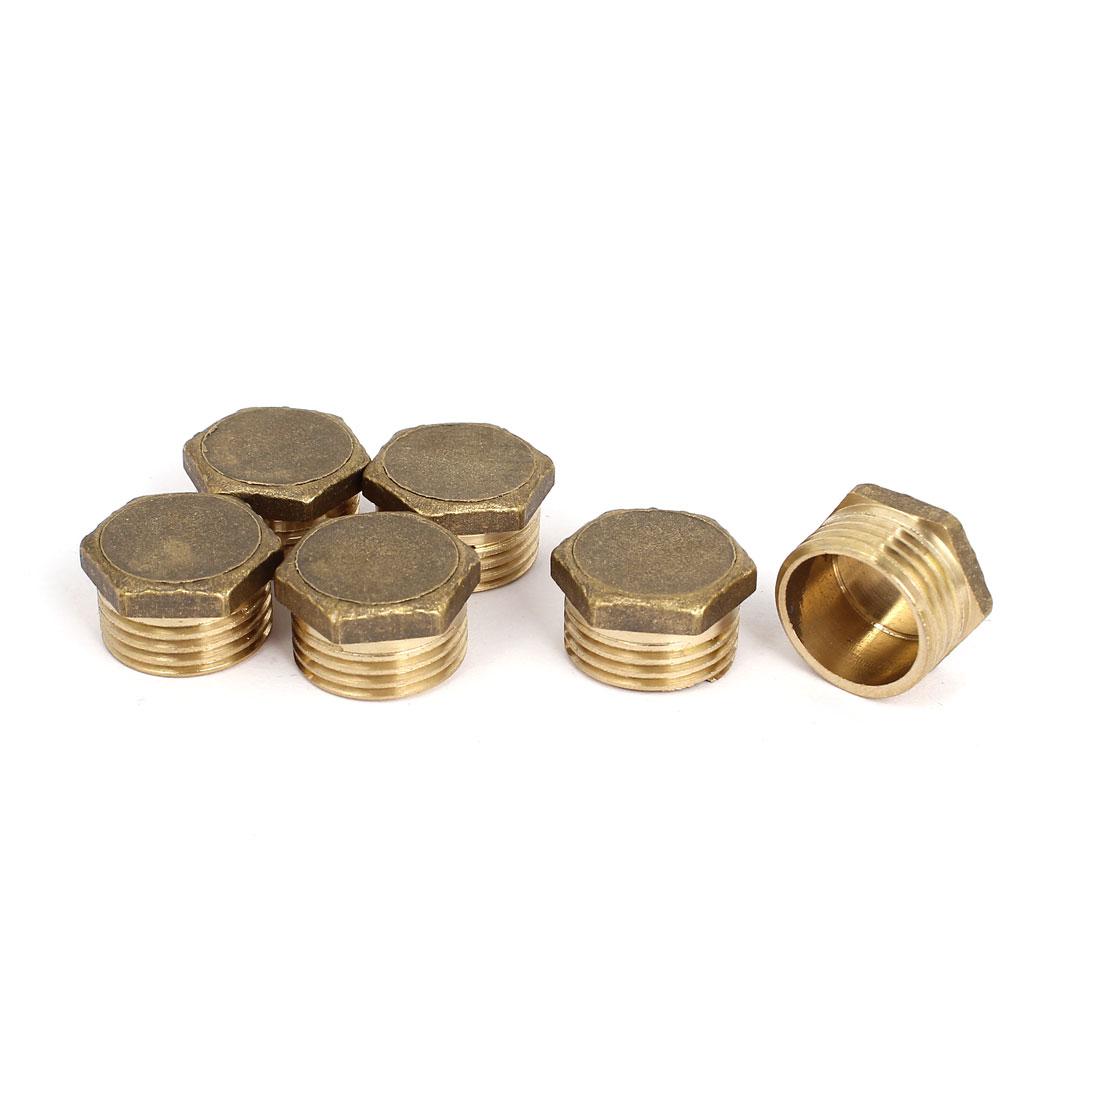 1/2BSP 20mm Thread Fuel Water Air Brass Pipe Hex Head Fitting 6 Pcs